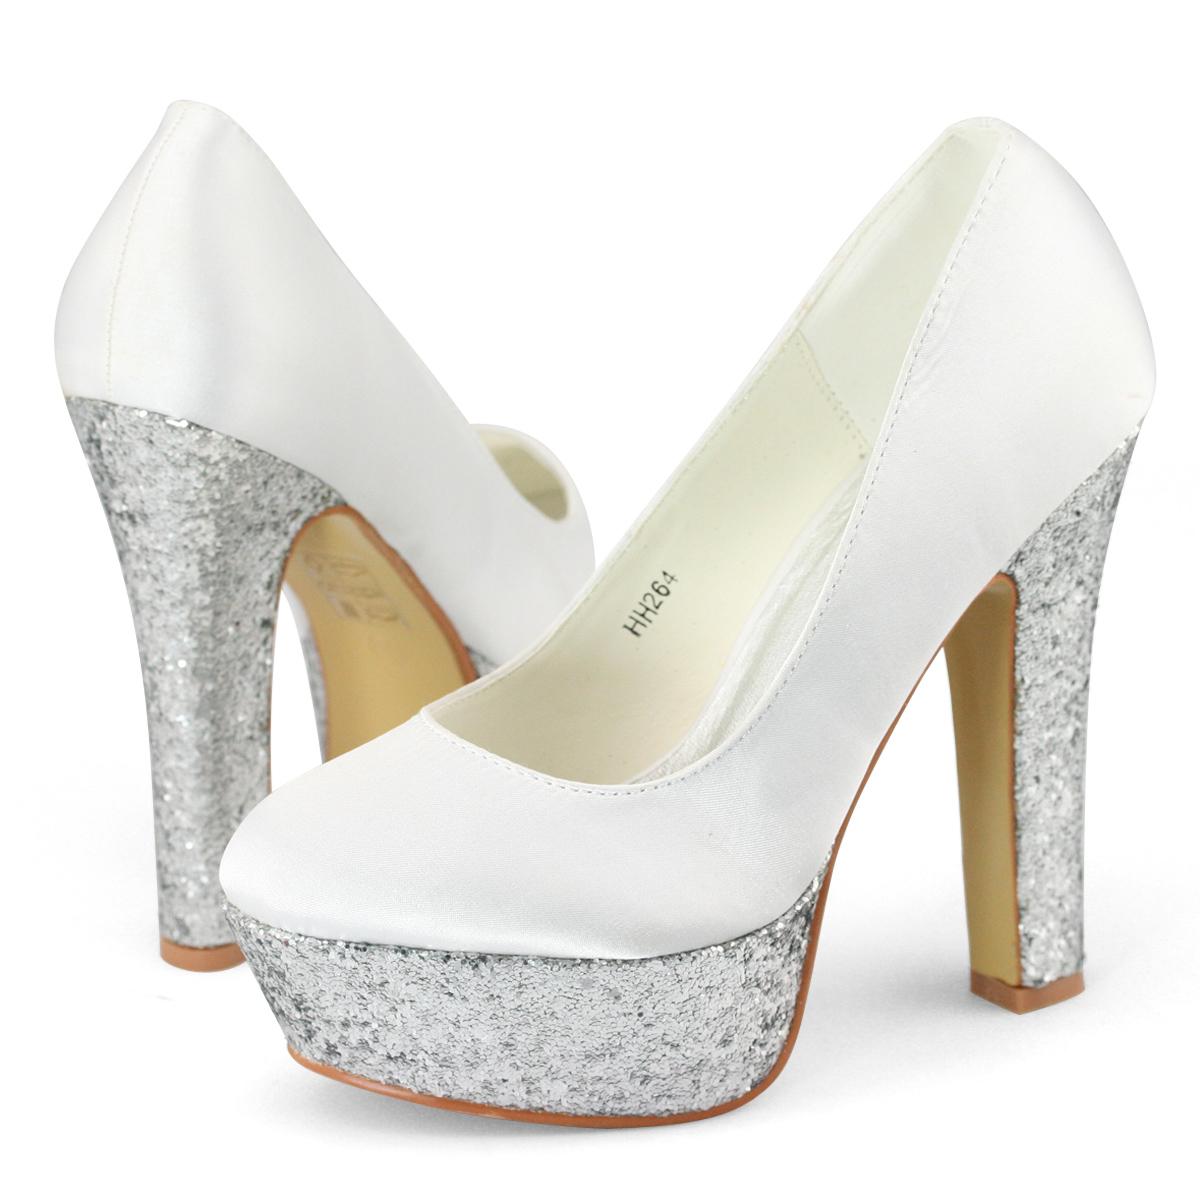 New Ladies High Block Heels Platform Pumps Satin White Silver Wedding Shoes Size